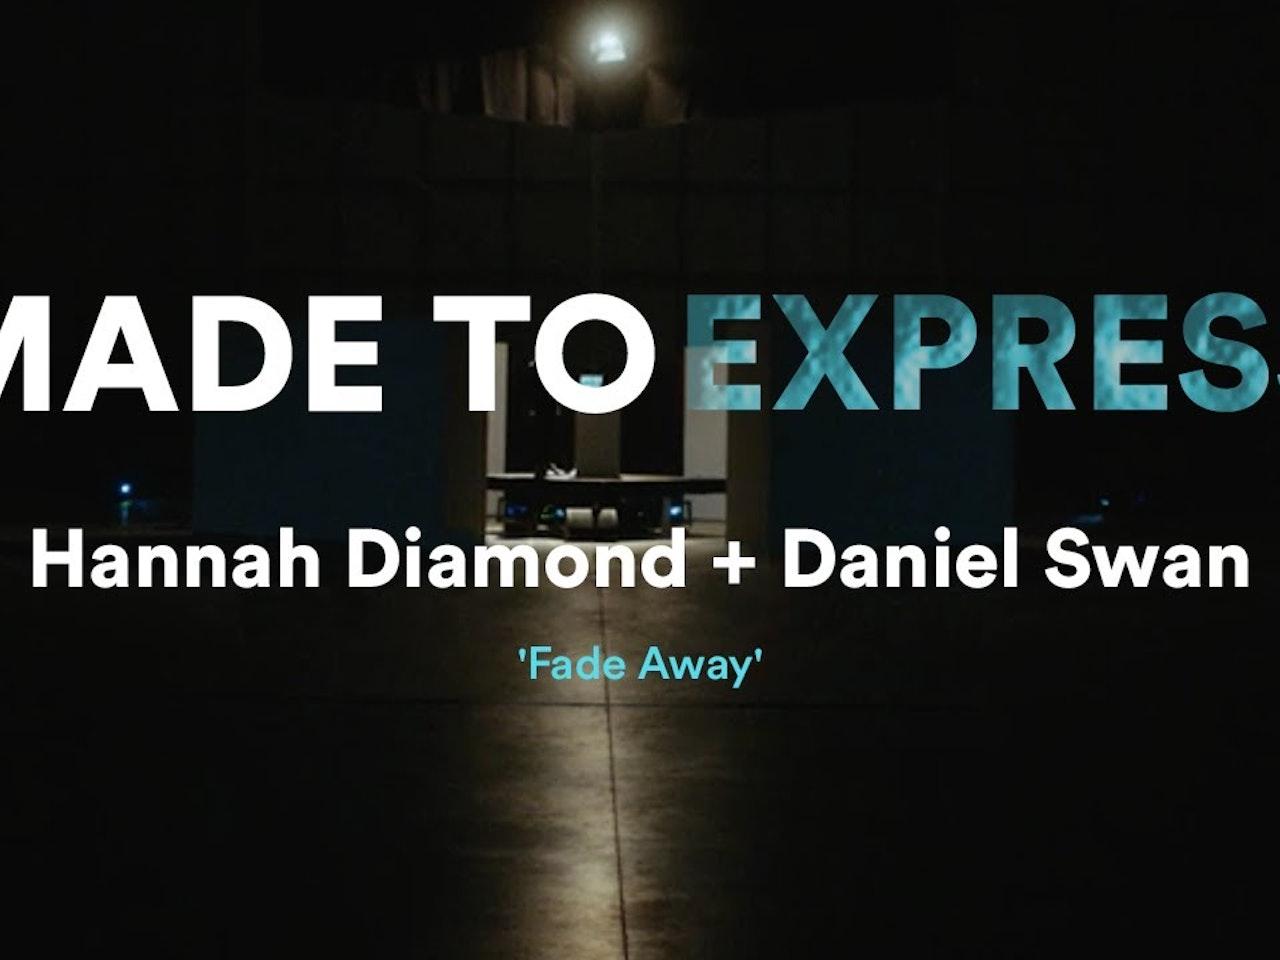 Hannah Diamond + Daniel Swan 'Fade Away' - Made to express // Novation